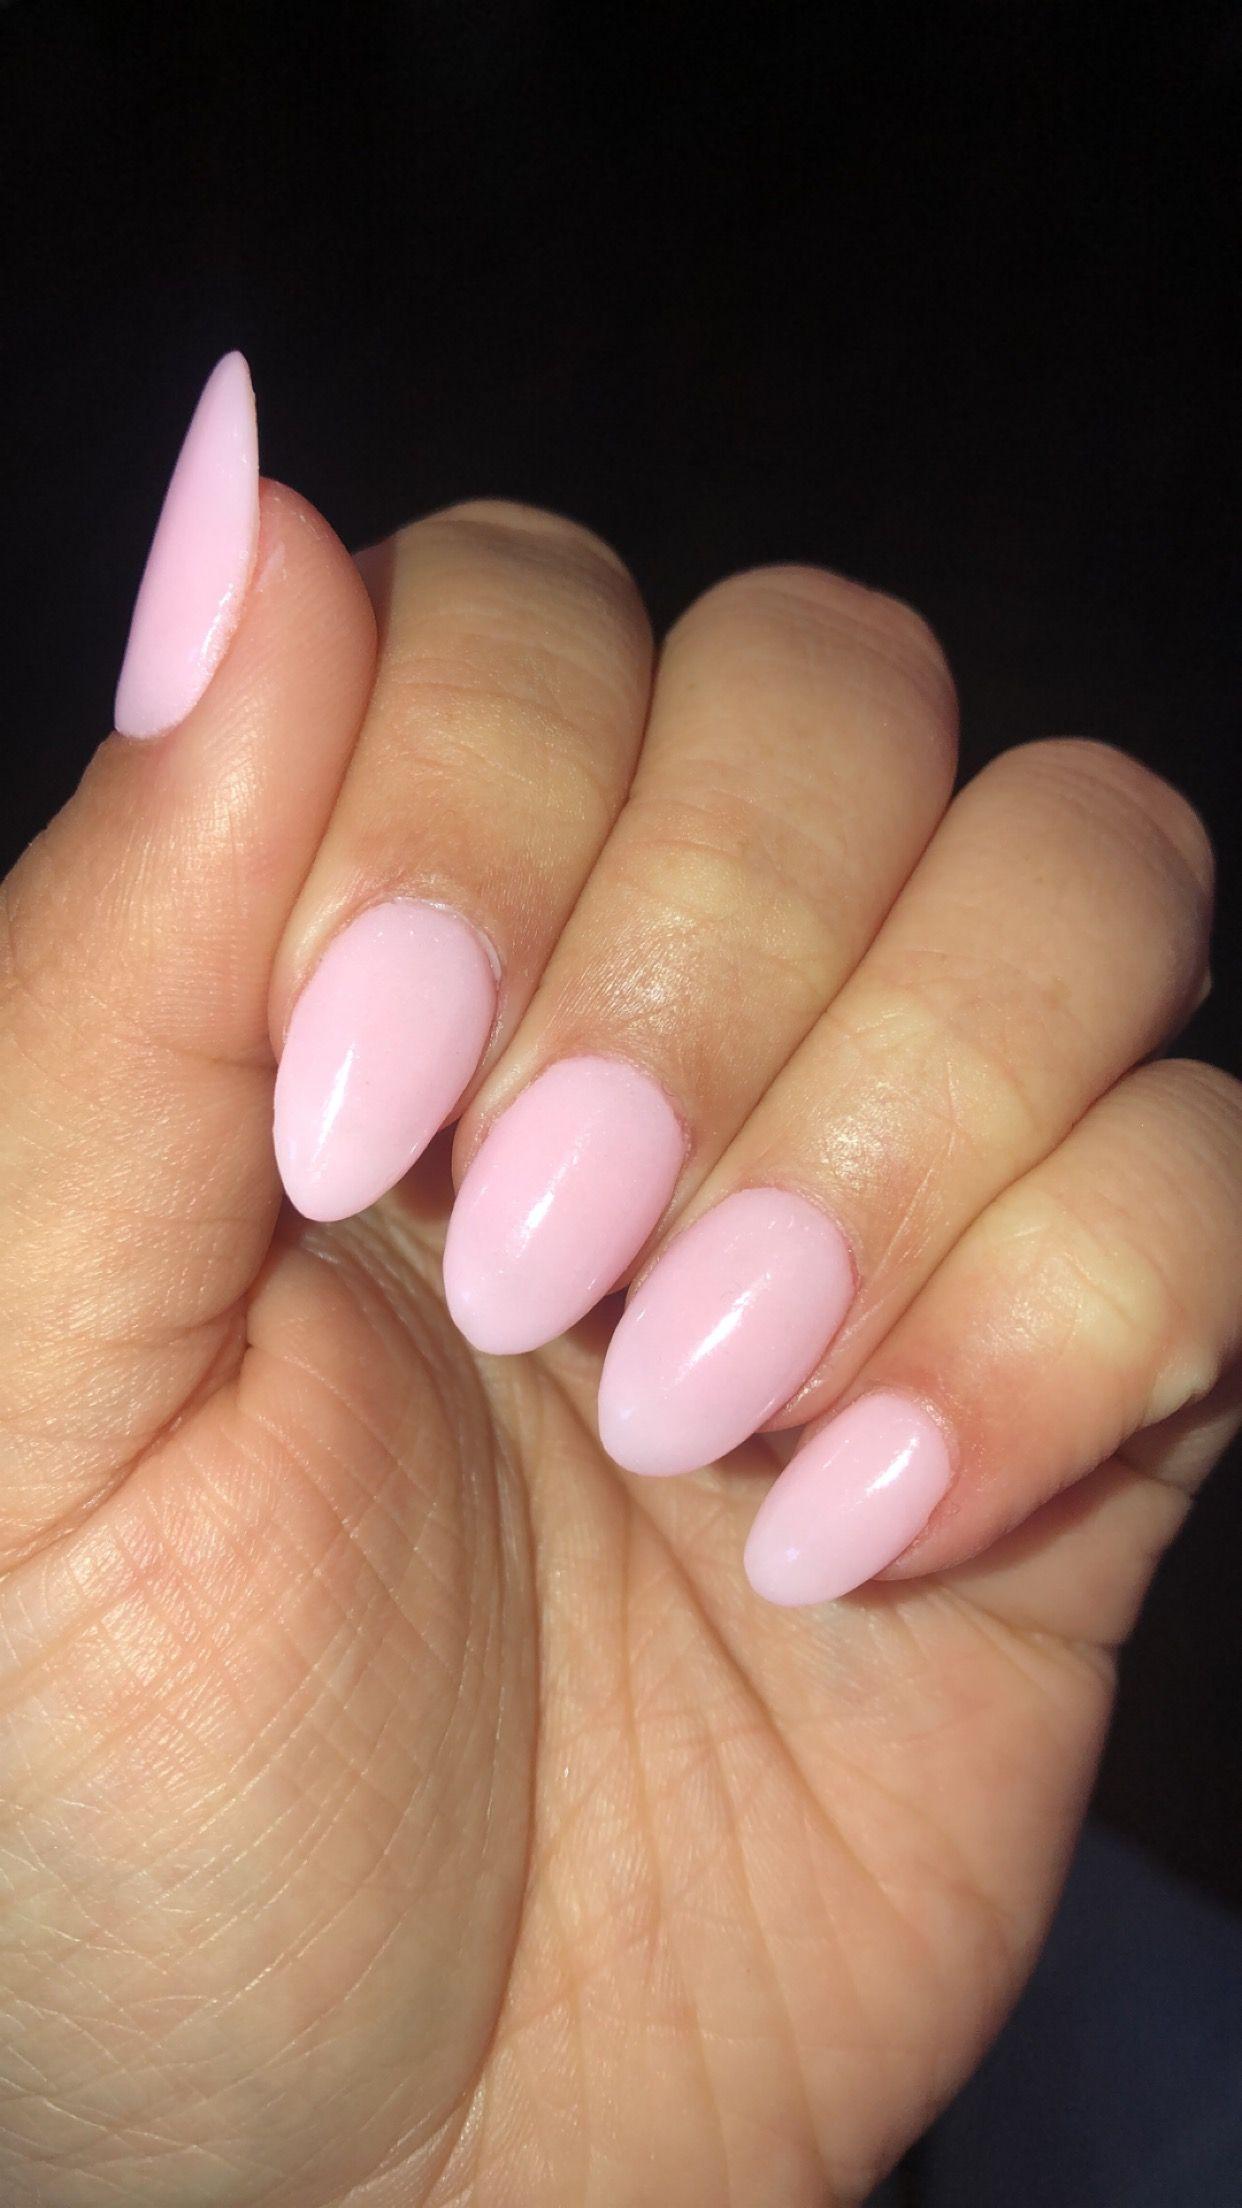 Light Pink Dip Powder Short Almond Nails In 2020 Short Almond Nails Almond Nails Pink Almond Nails